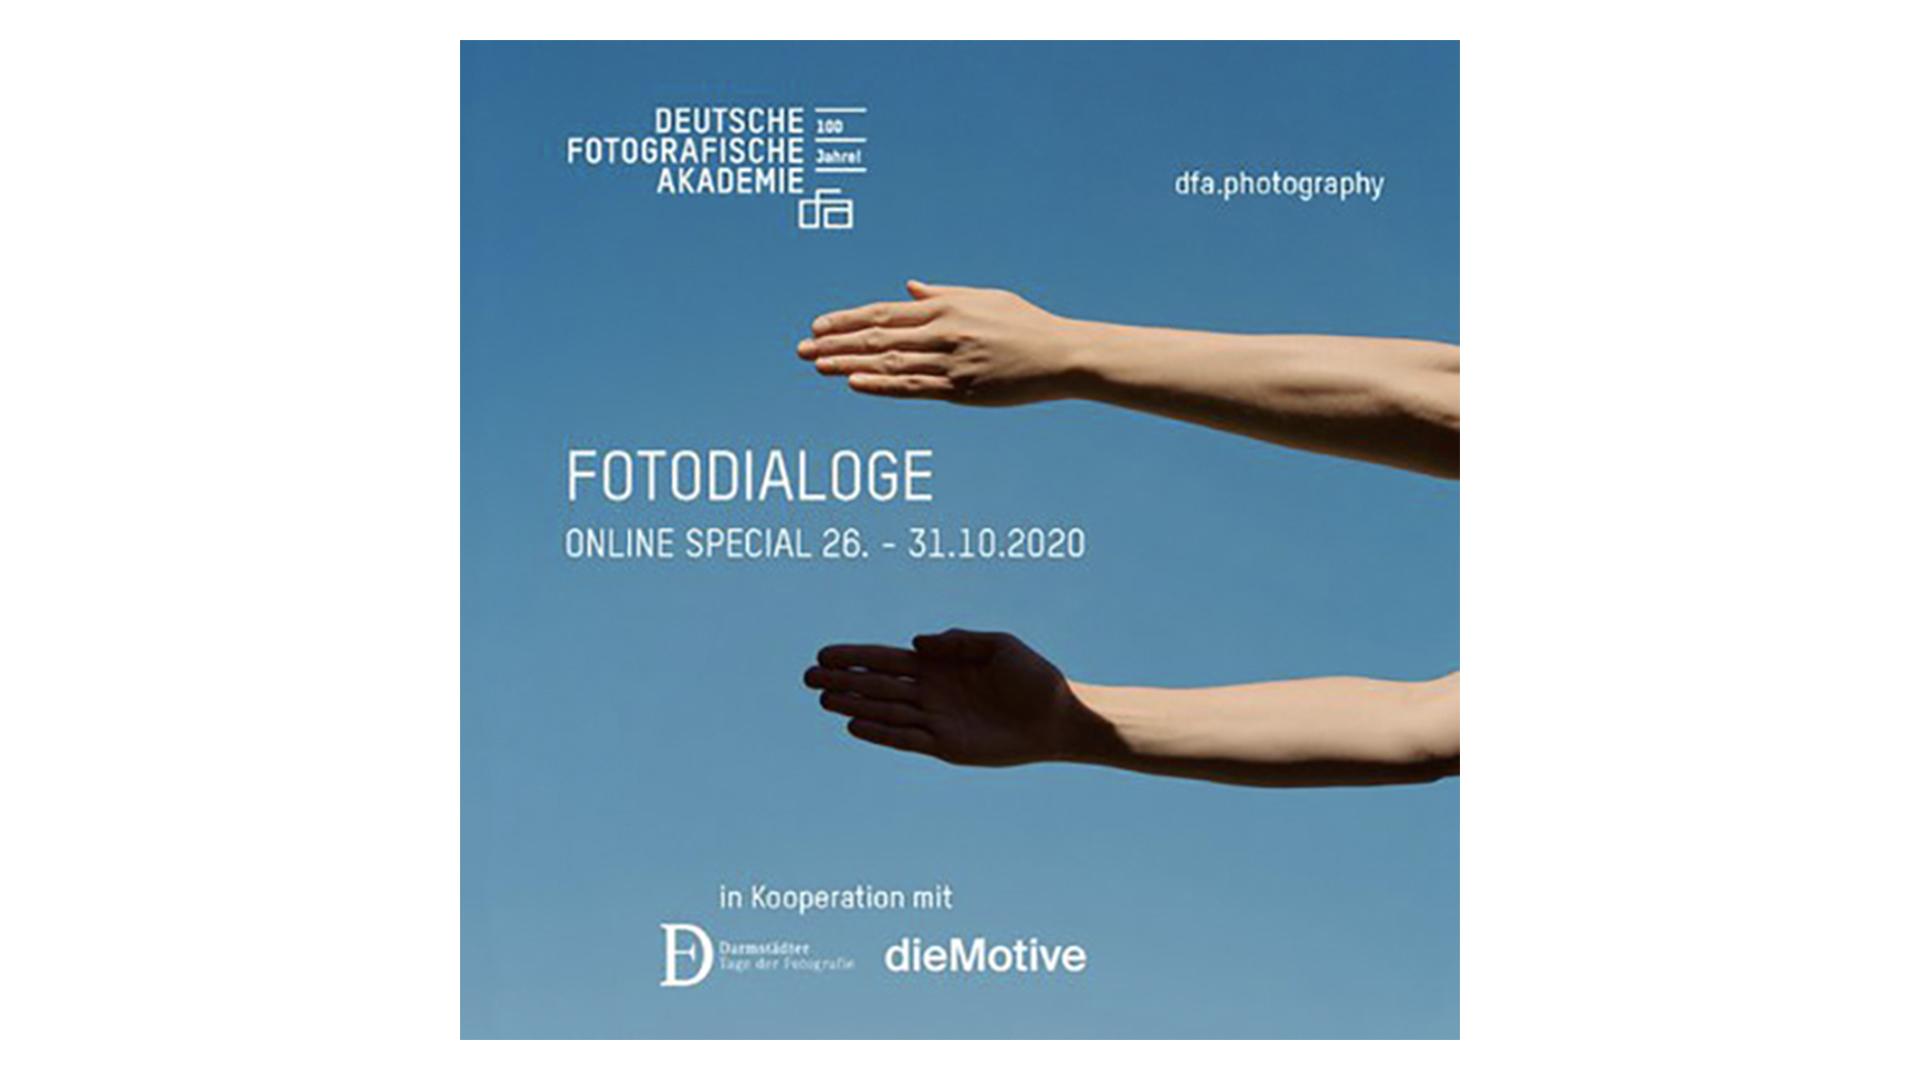 FOTODIALOGE Online Special